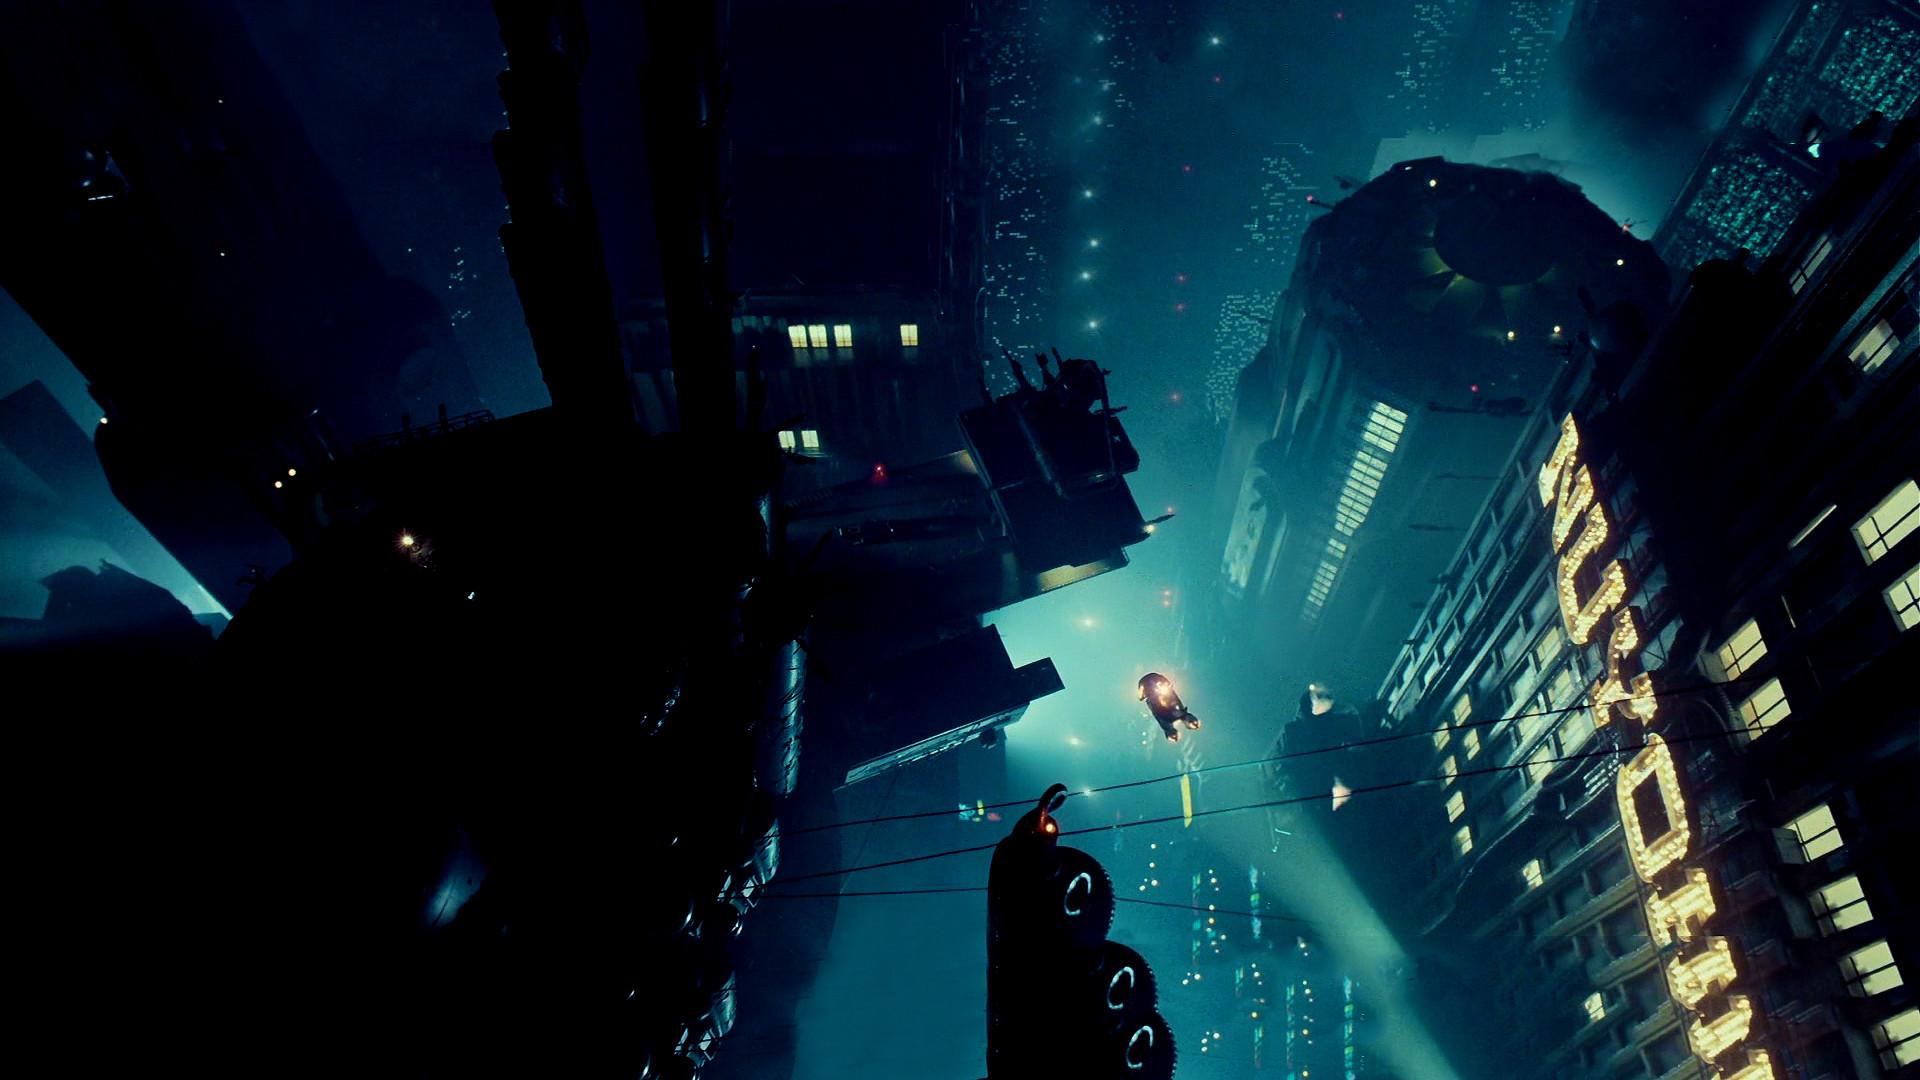 Blade Runner 2049 Wallpapers From Trailer 1920x1080: Blade Runner Wallpapers ·① WallpaperTag